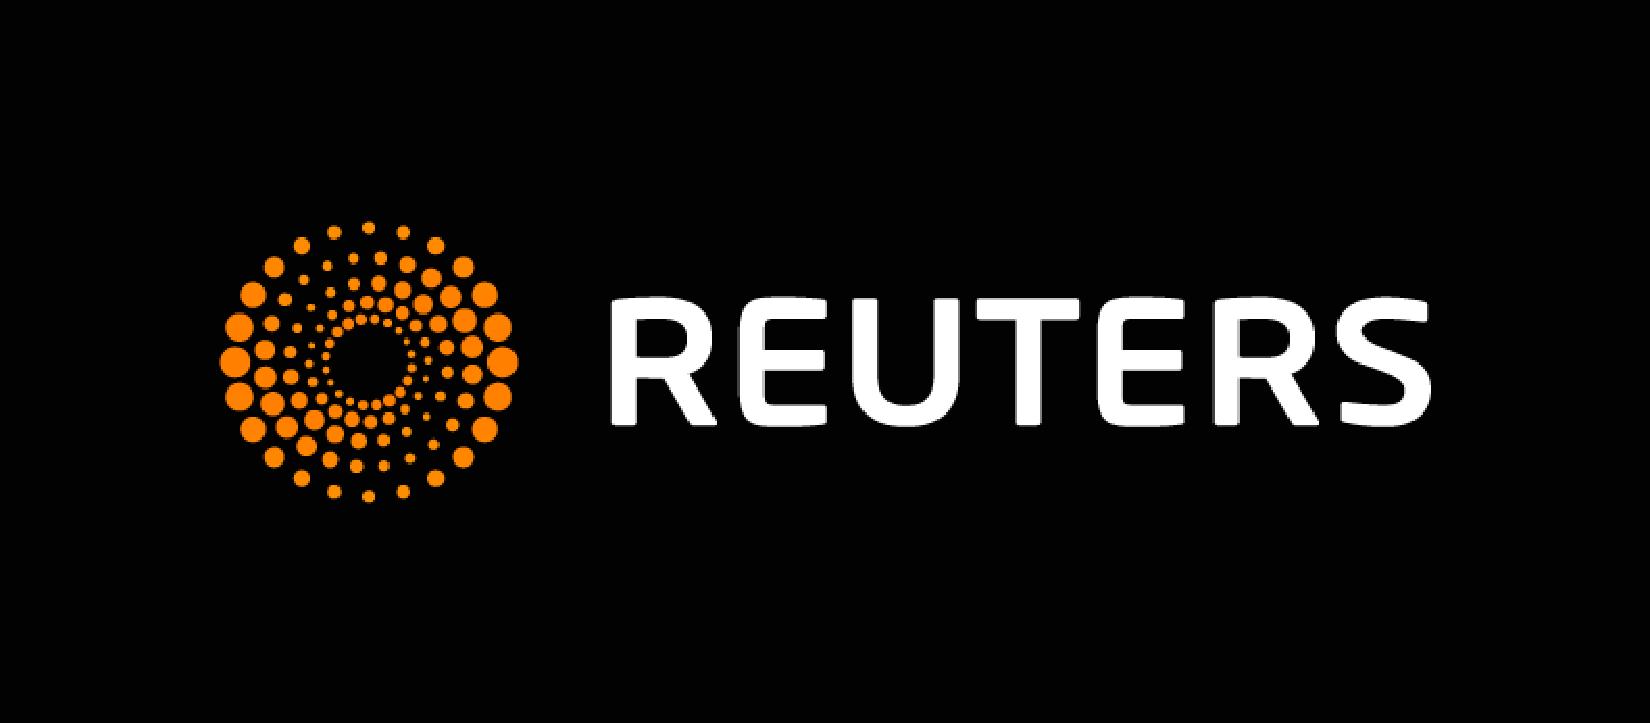 Reuters PNG-PlusPNG.com-1650 - Reuters PNG